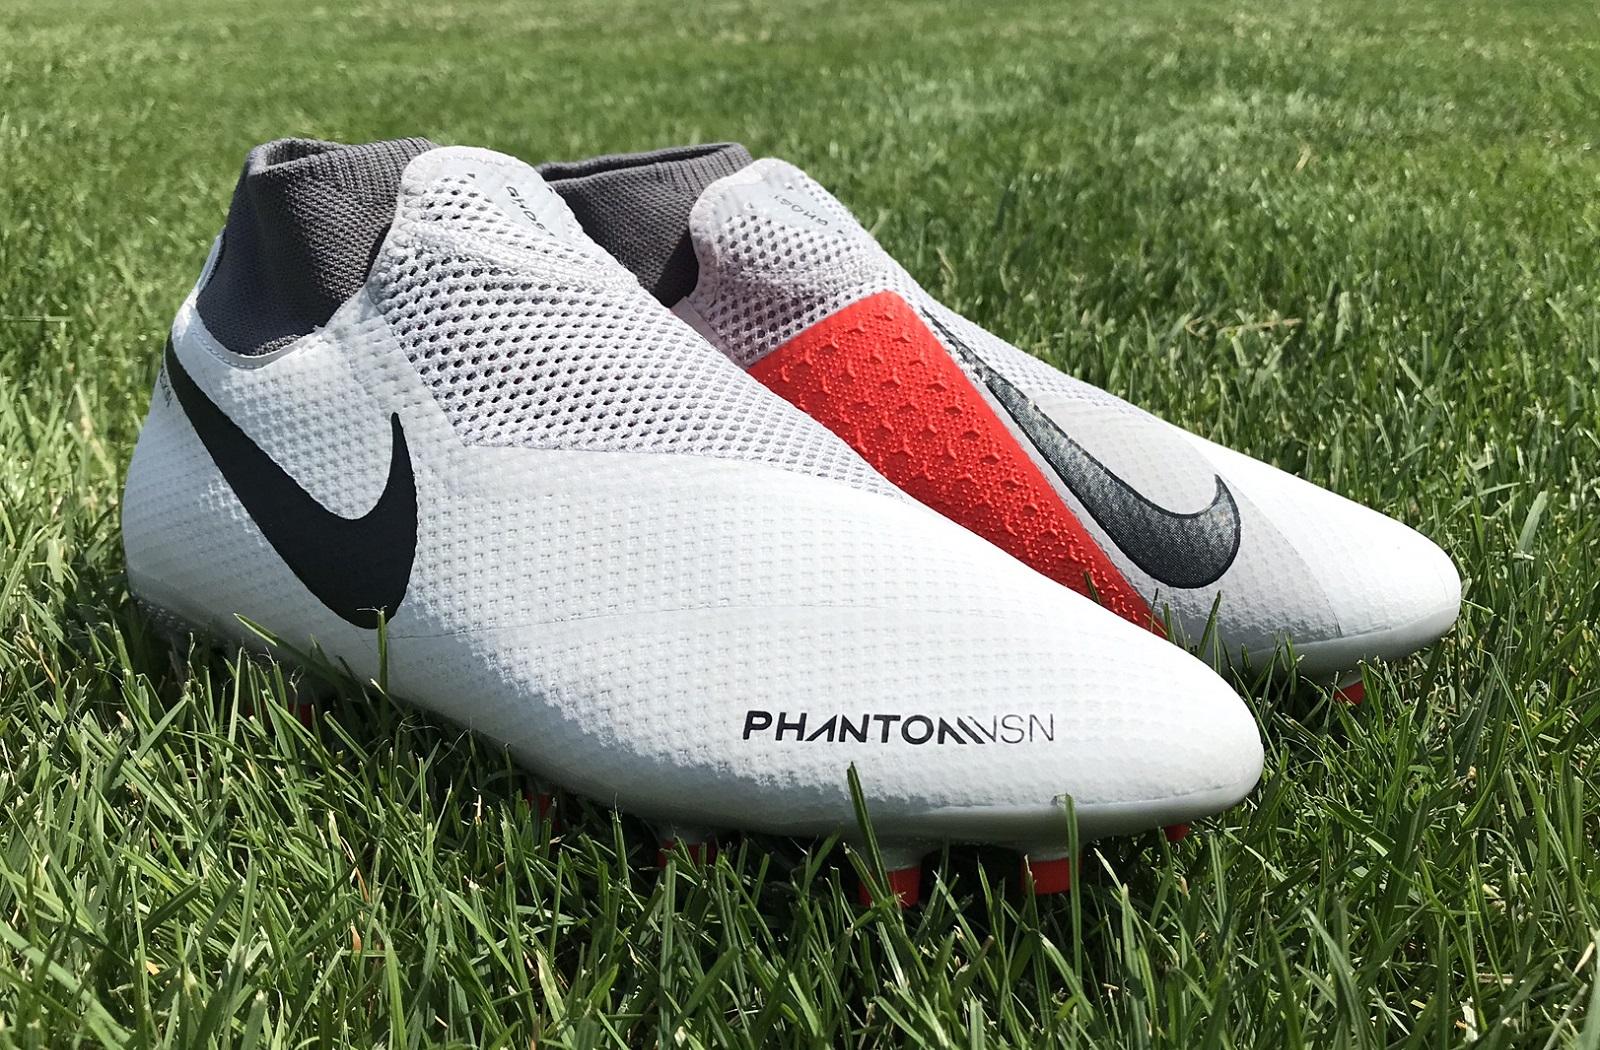 9ea16de07747 Nike Phantom Vision Pro DF Boot Review